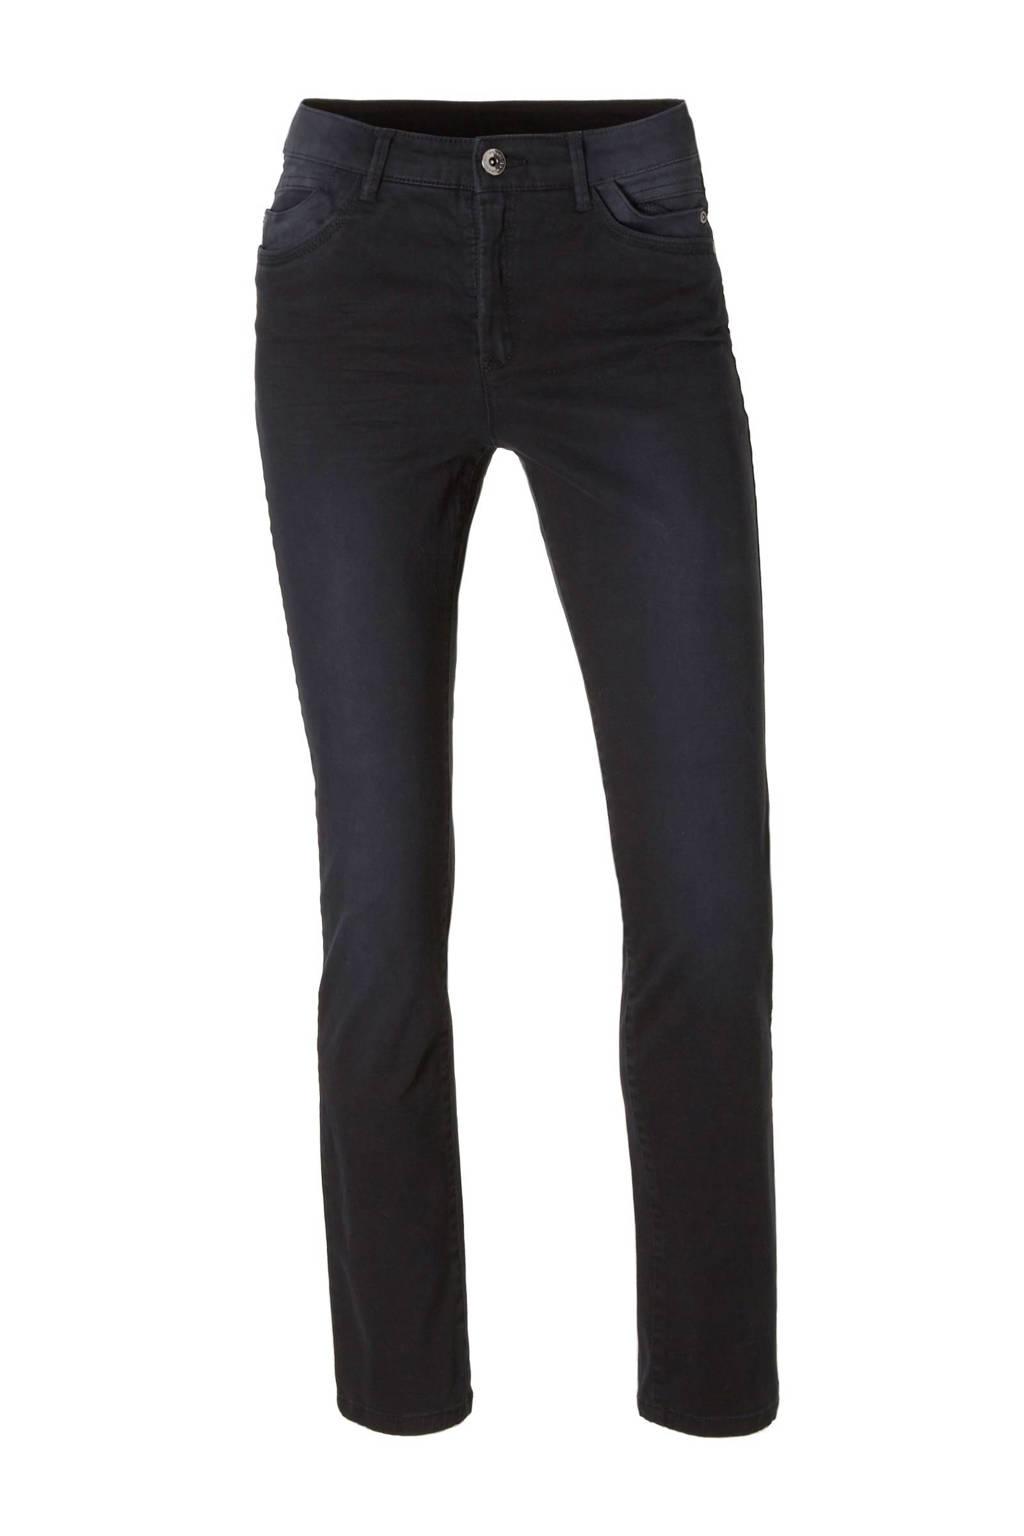 C&A Yessica slim fit broek, Zwart